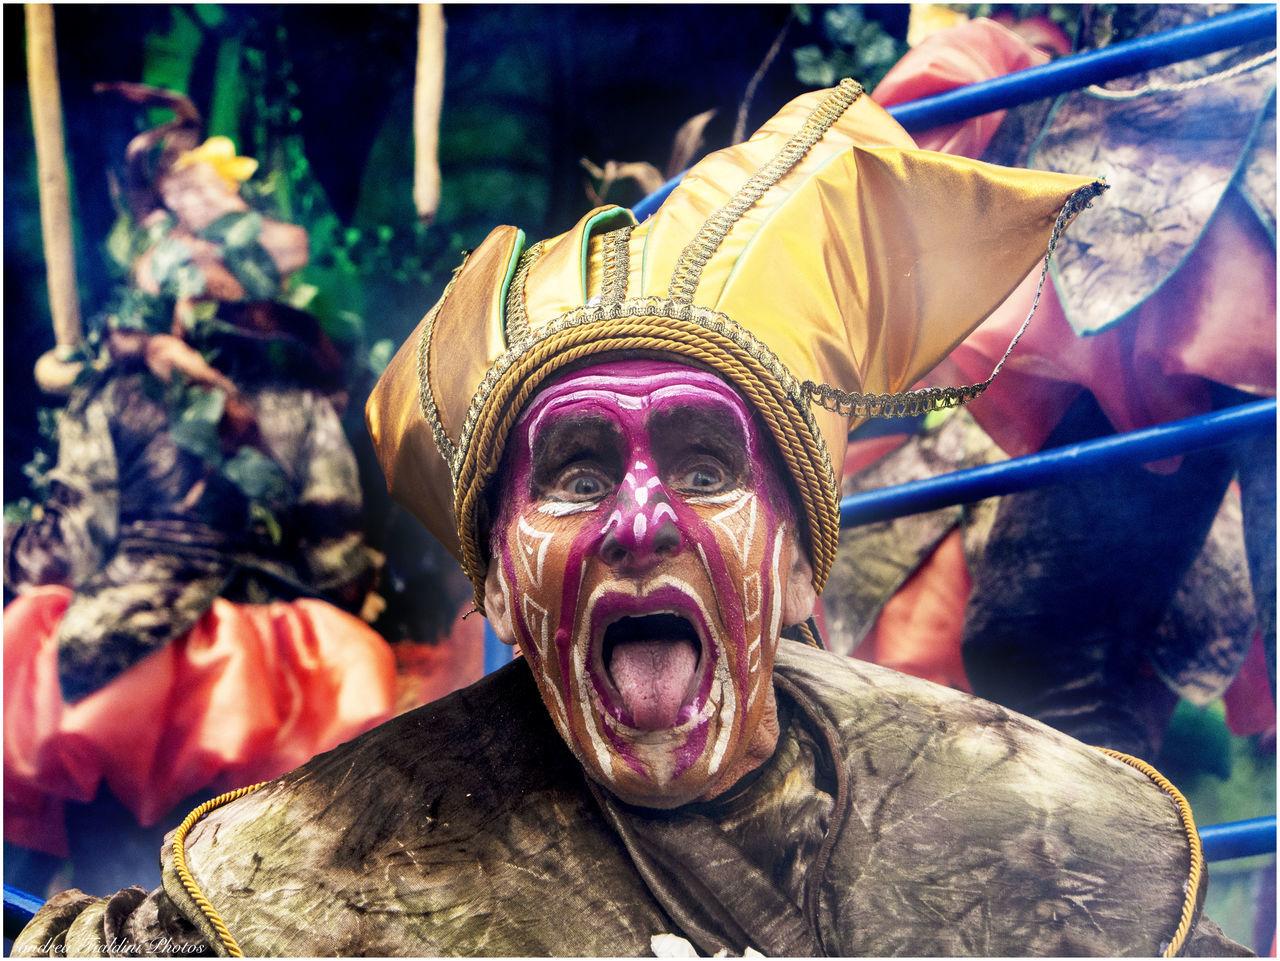 Adult Carnevale Di Viareggio Carnival Carnival Spirit Cultura Cultures Day Italia Italy Men Outdoors People Pepole Pepole Photography Performing Arts Event Portrait Religion Statue Toscana Toscana ıtaly Tradizionipopolari Tuscany Versilia  Viareggio Carnival Viareggio Italy